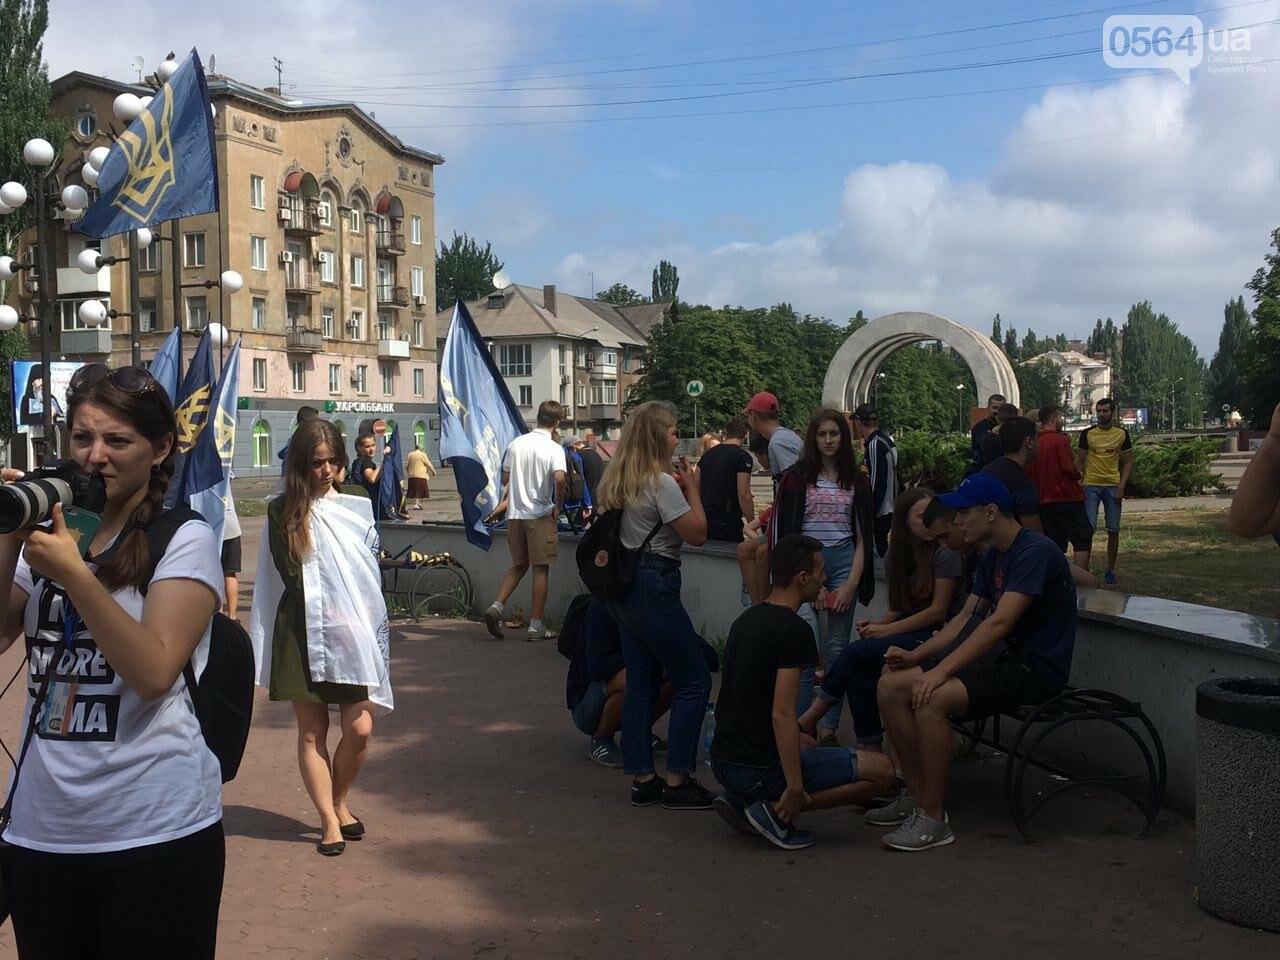 Трубят рога: В Кривом Роге собрались противники ЛГБТ-движения, - ФОТО, ВИДЕО, фото-1